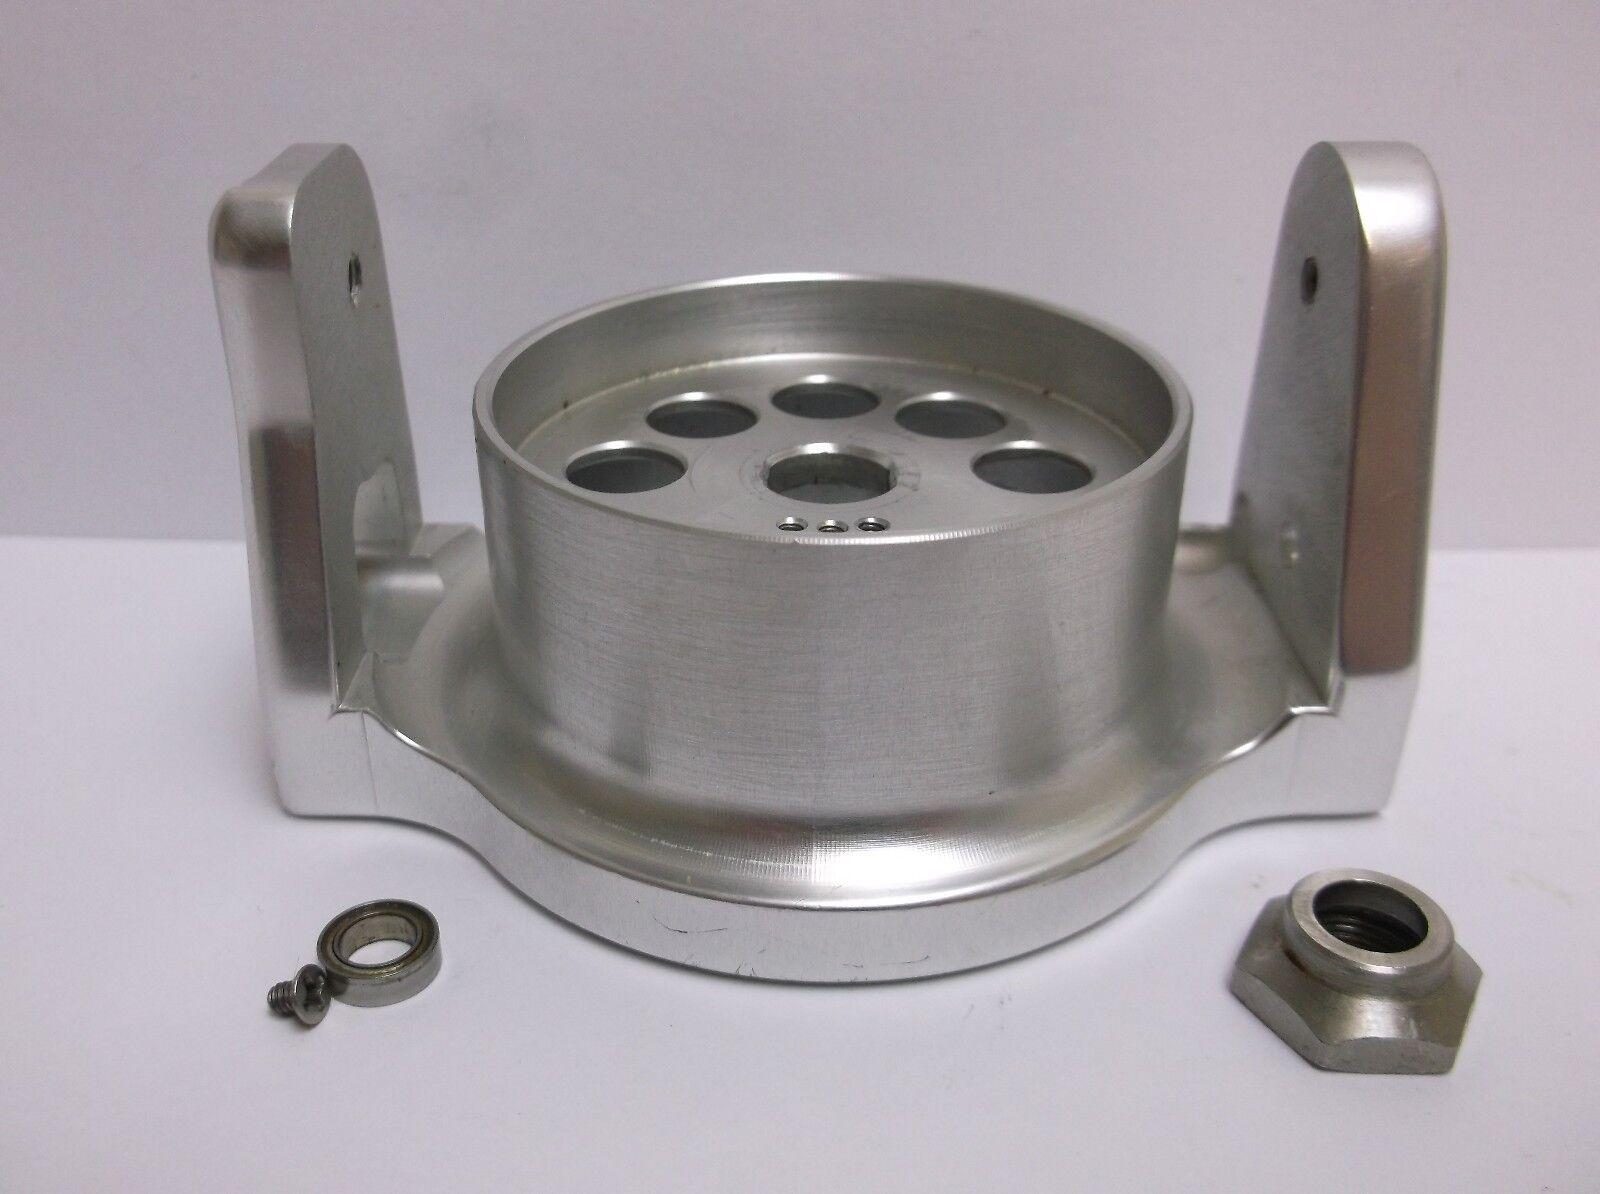 Parte utilizada precisa Spinning Carretes-SR-20 montaje twinspin-rojoor